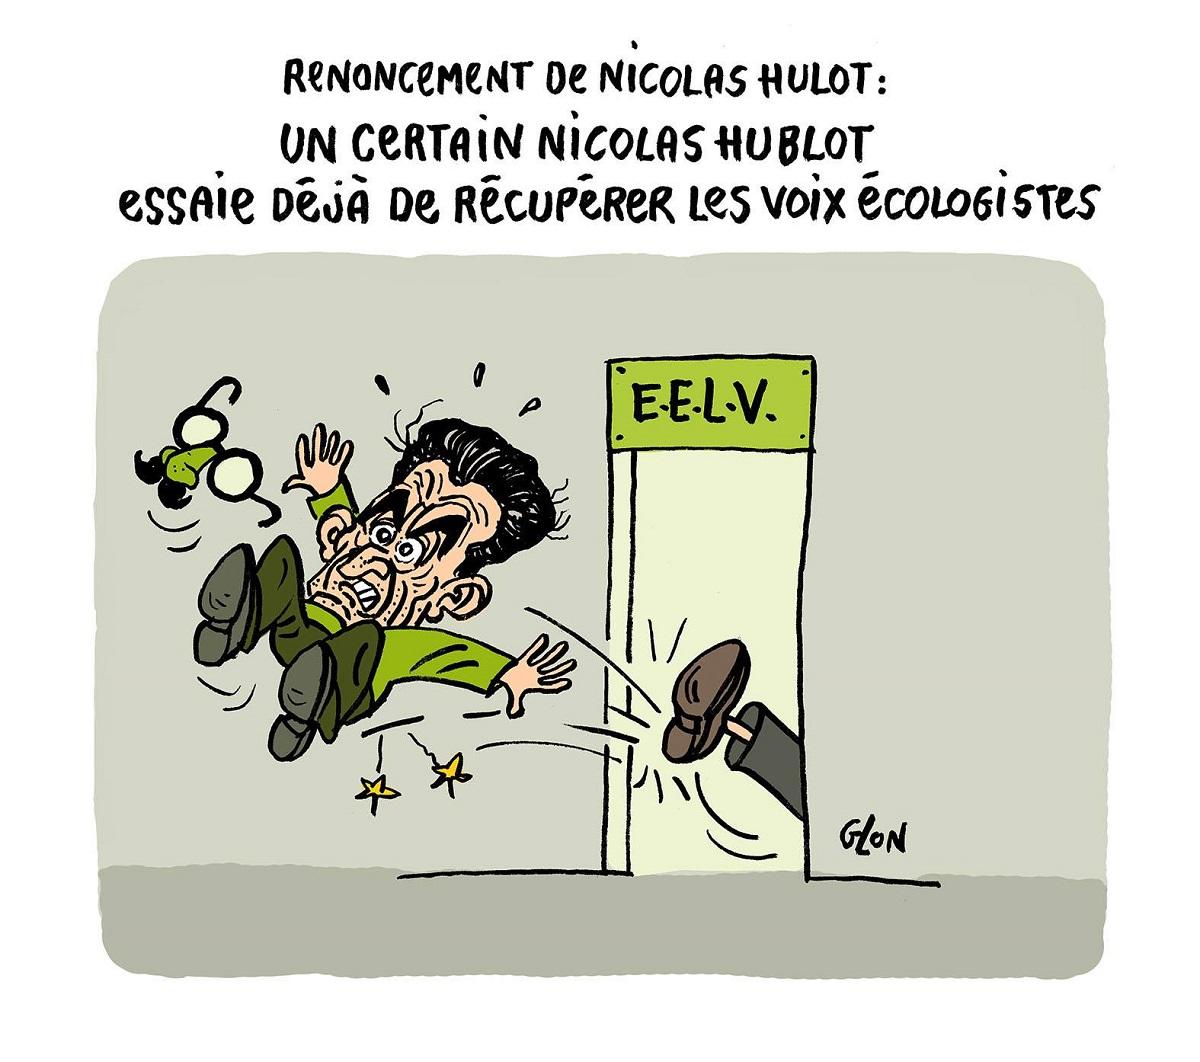 dessin d'actualité montrant Nicolas Sarkozy éjecté de EELV